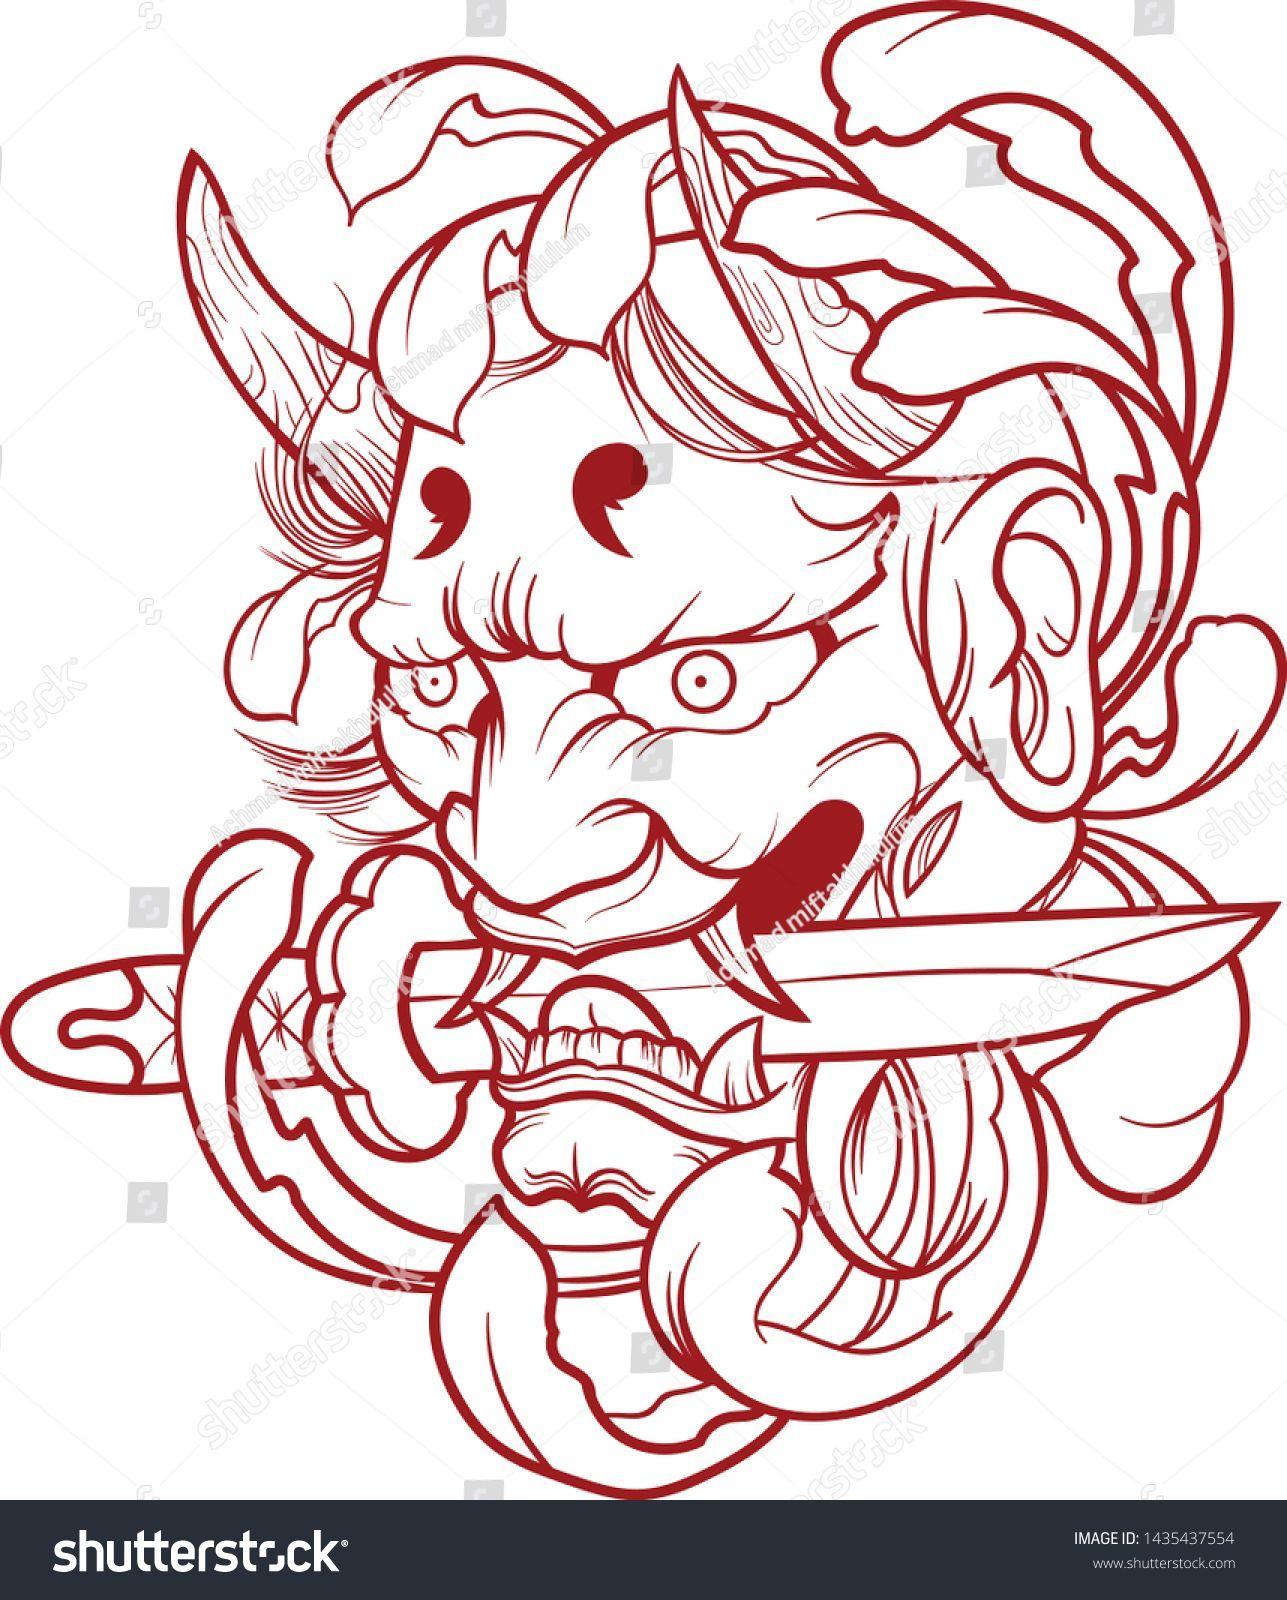 Samurai Mask Japanese Illustration Vector Free Illustration Japanese Mask Royalty Samurai Stoc In 2020 Samurai Tattoo Design Japanese Tattoo Art Japanese Tattoo